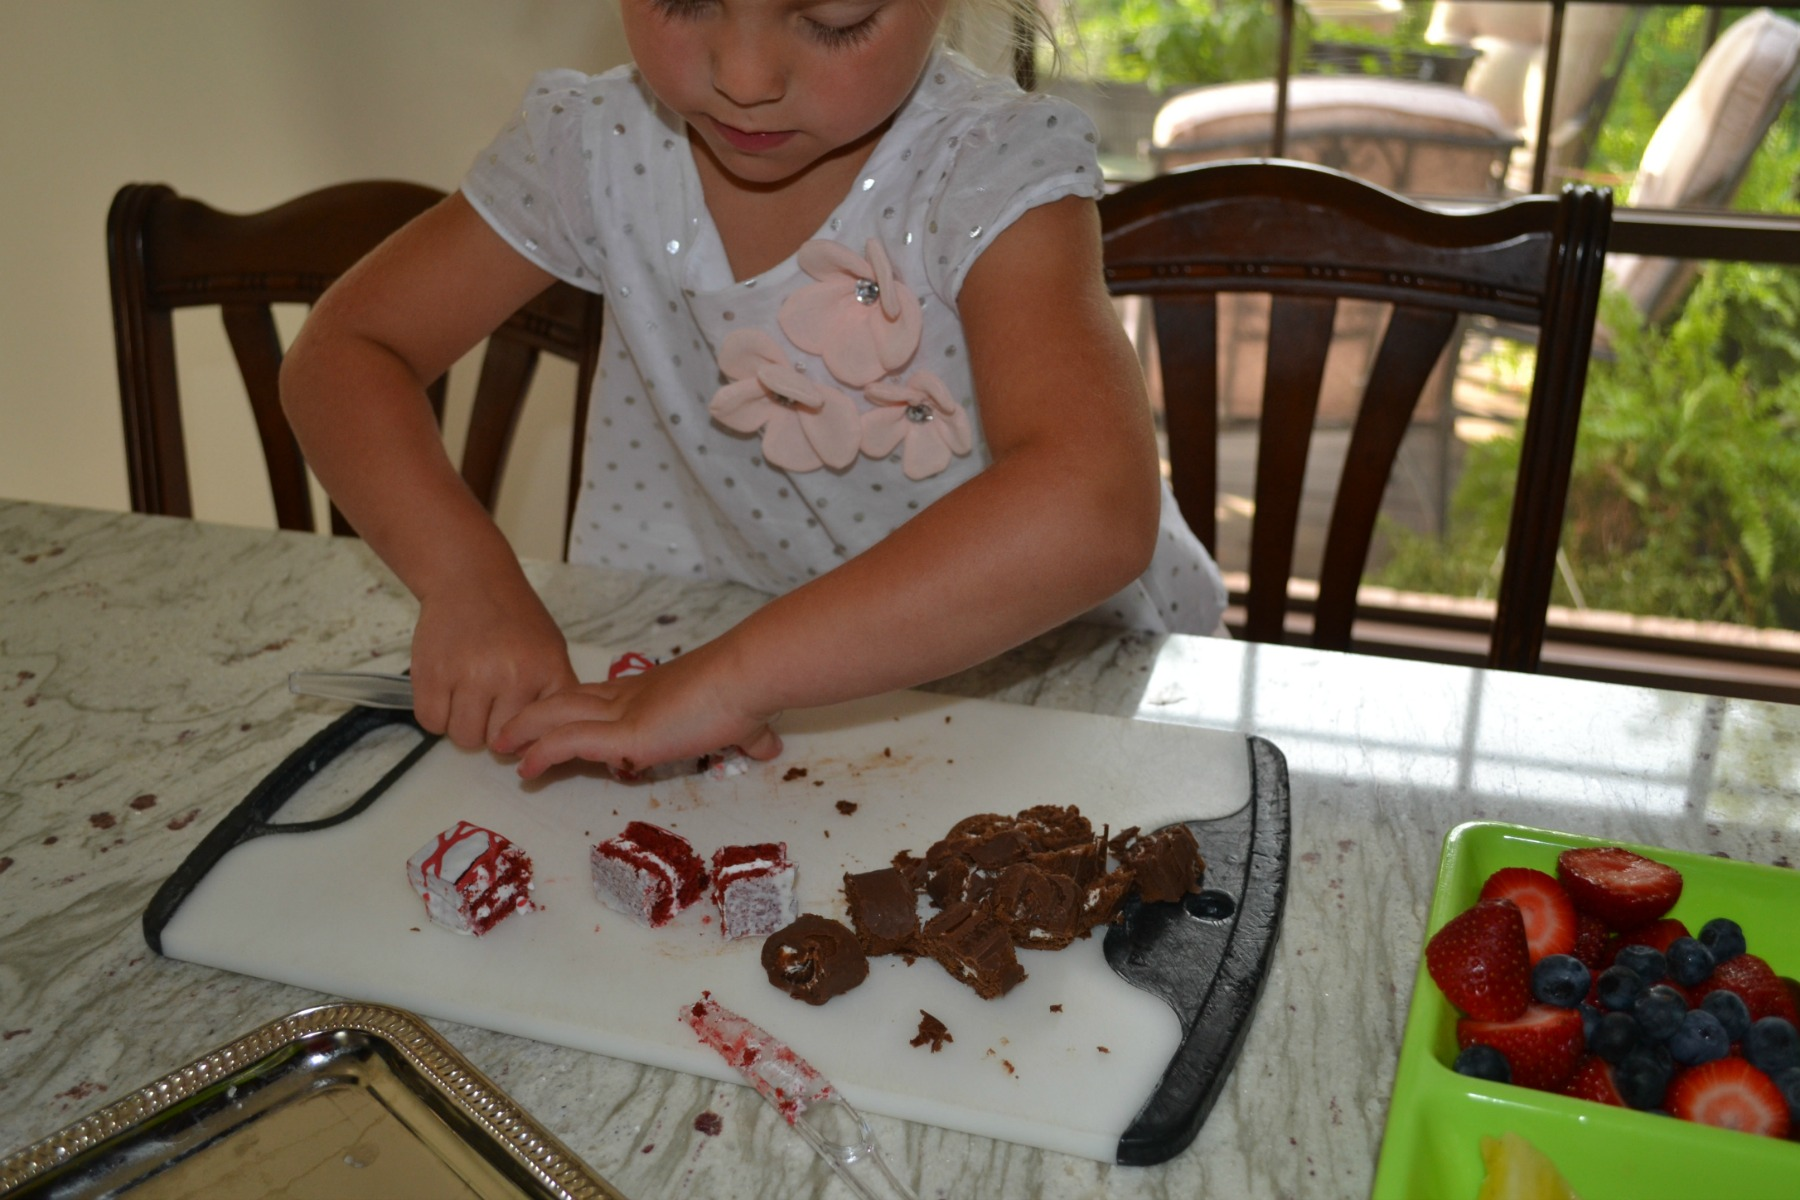 fruit, snack cakes, dessert kabobs, kids cooking